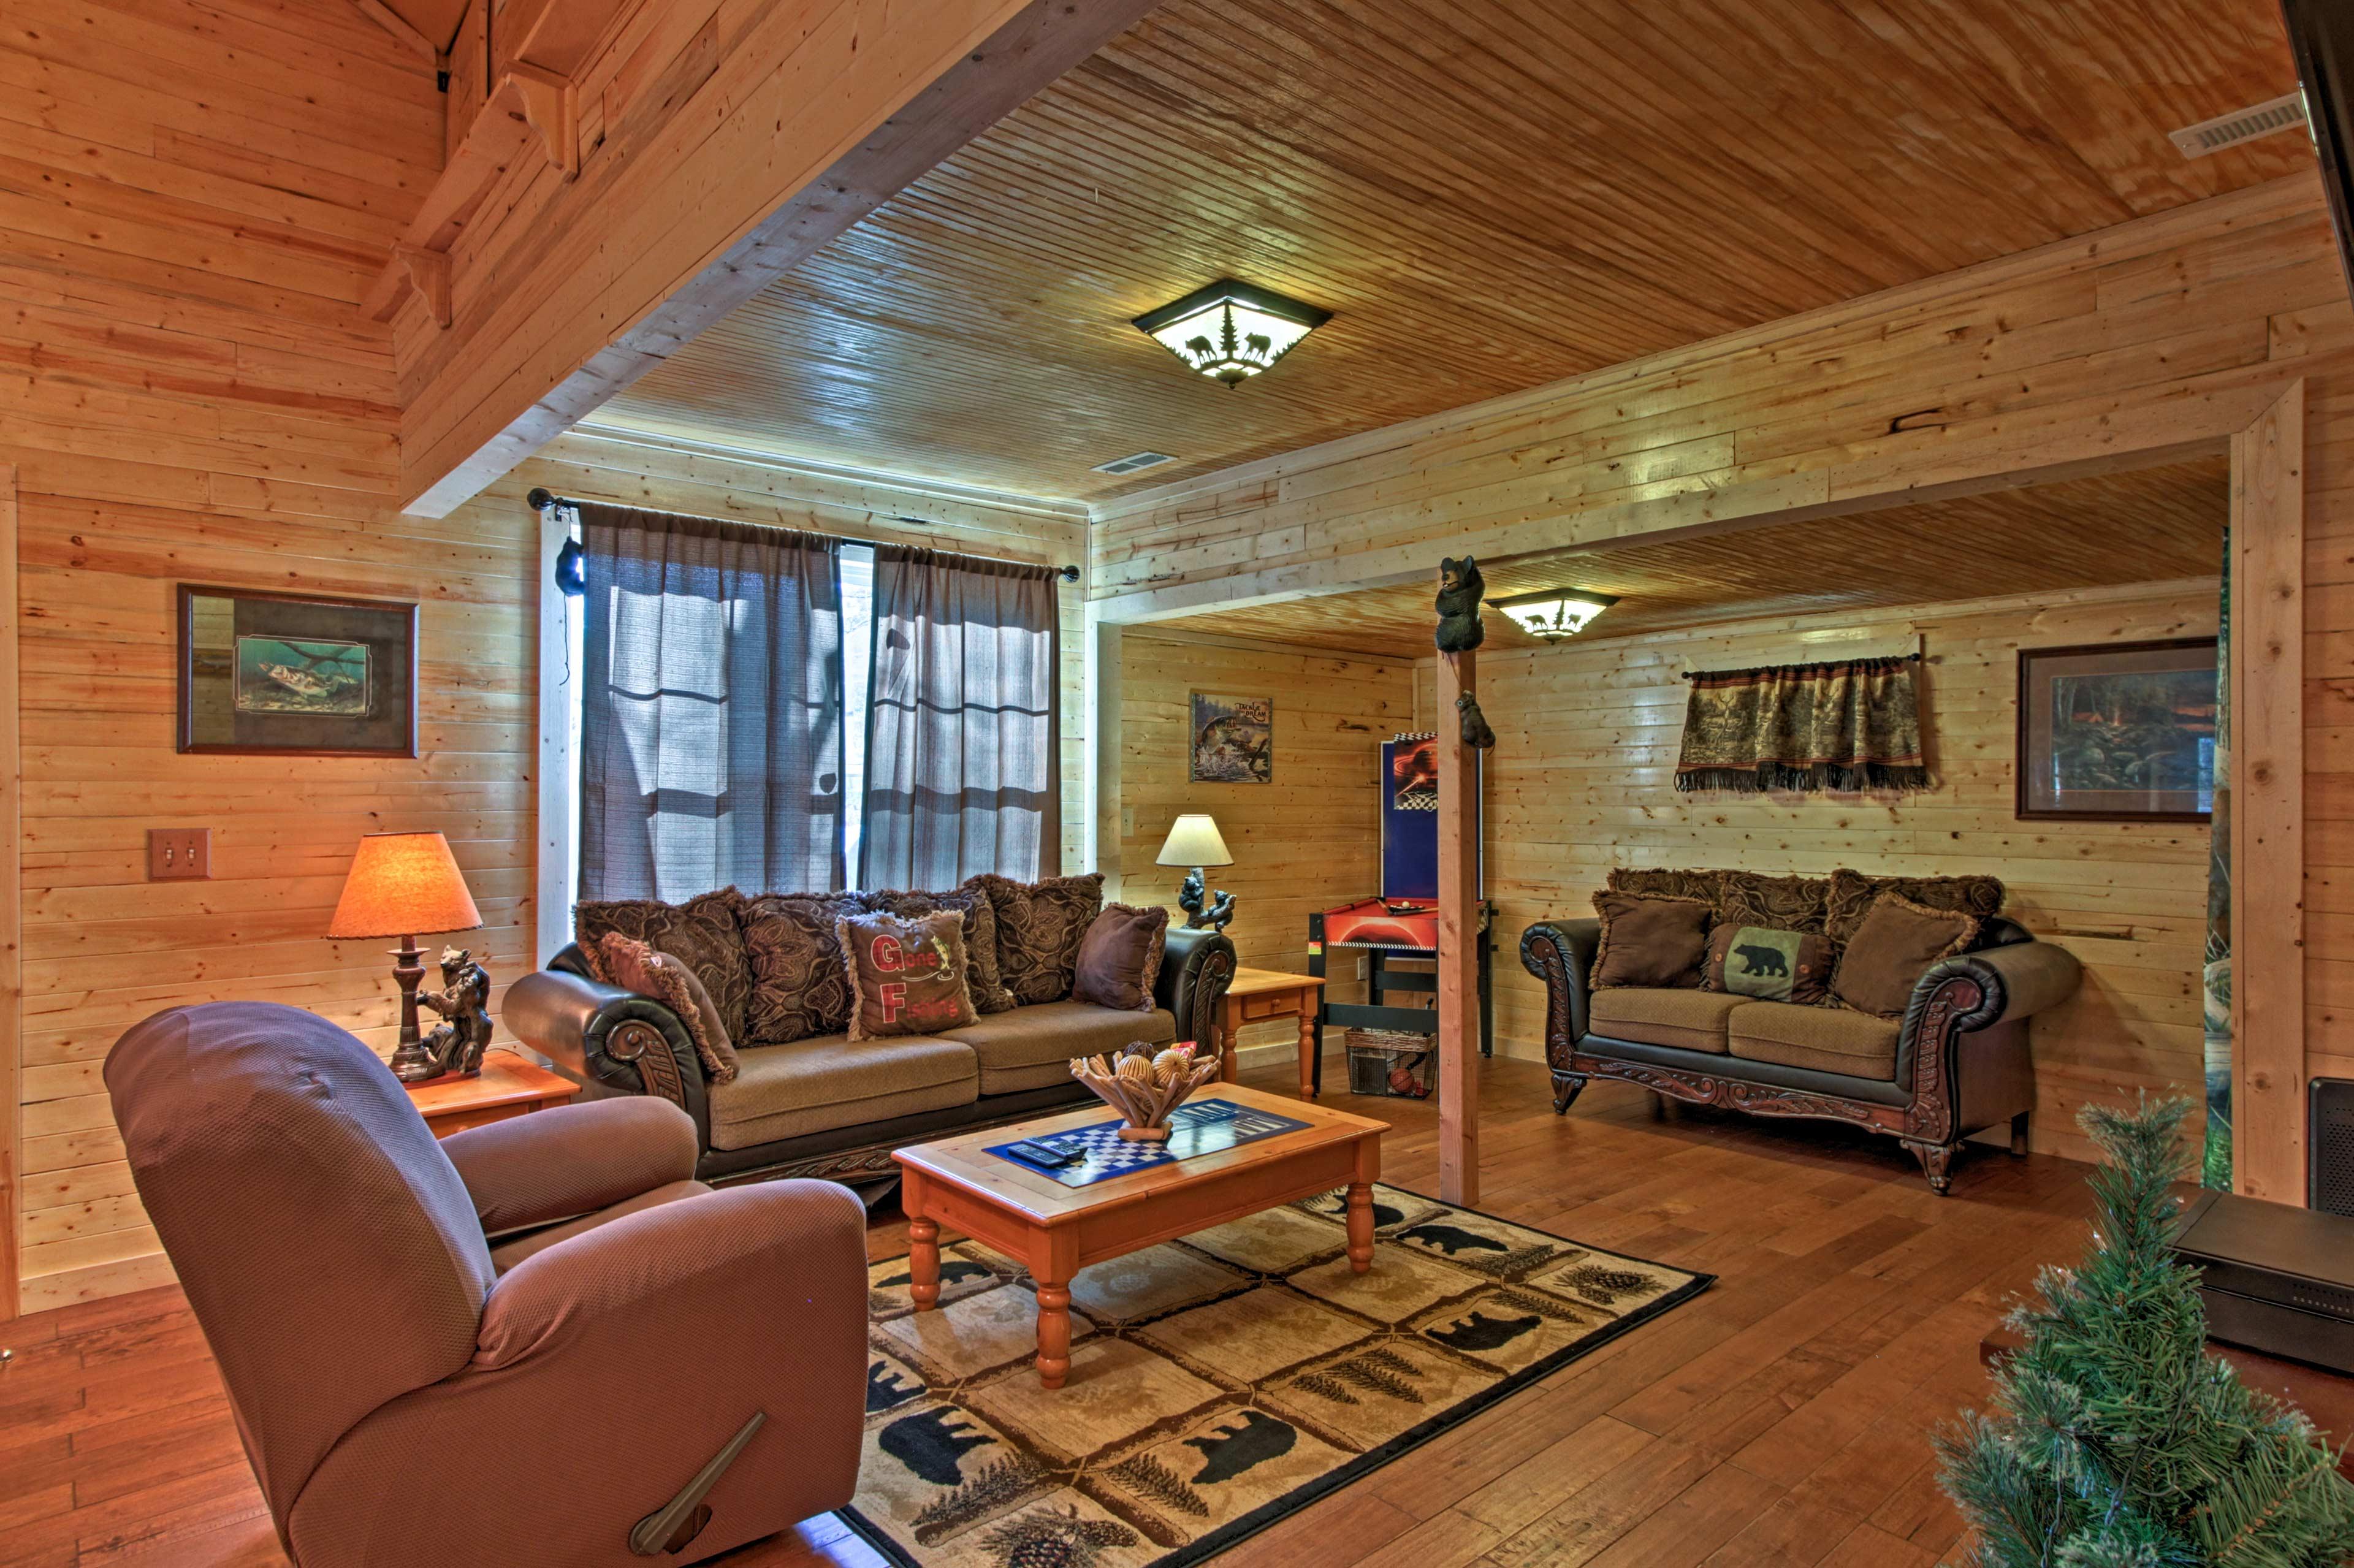 This 2-bedroom, 1-bathroom cabin in Sevierville comfortably sleeps 4.